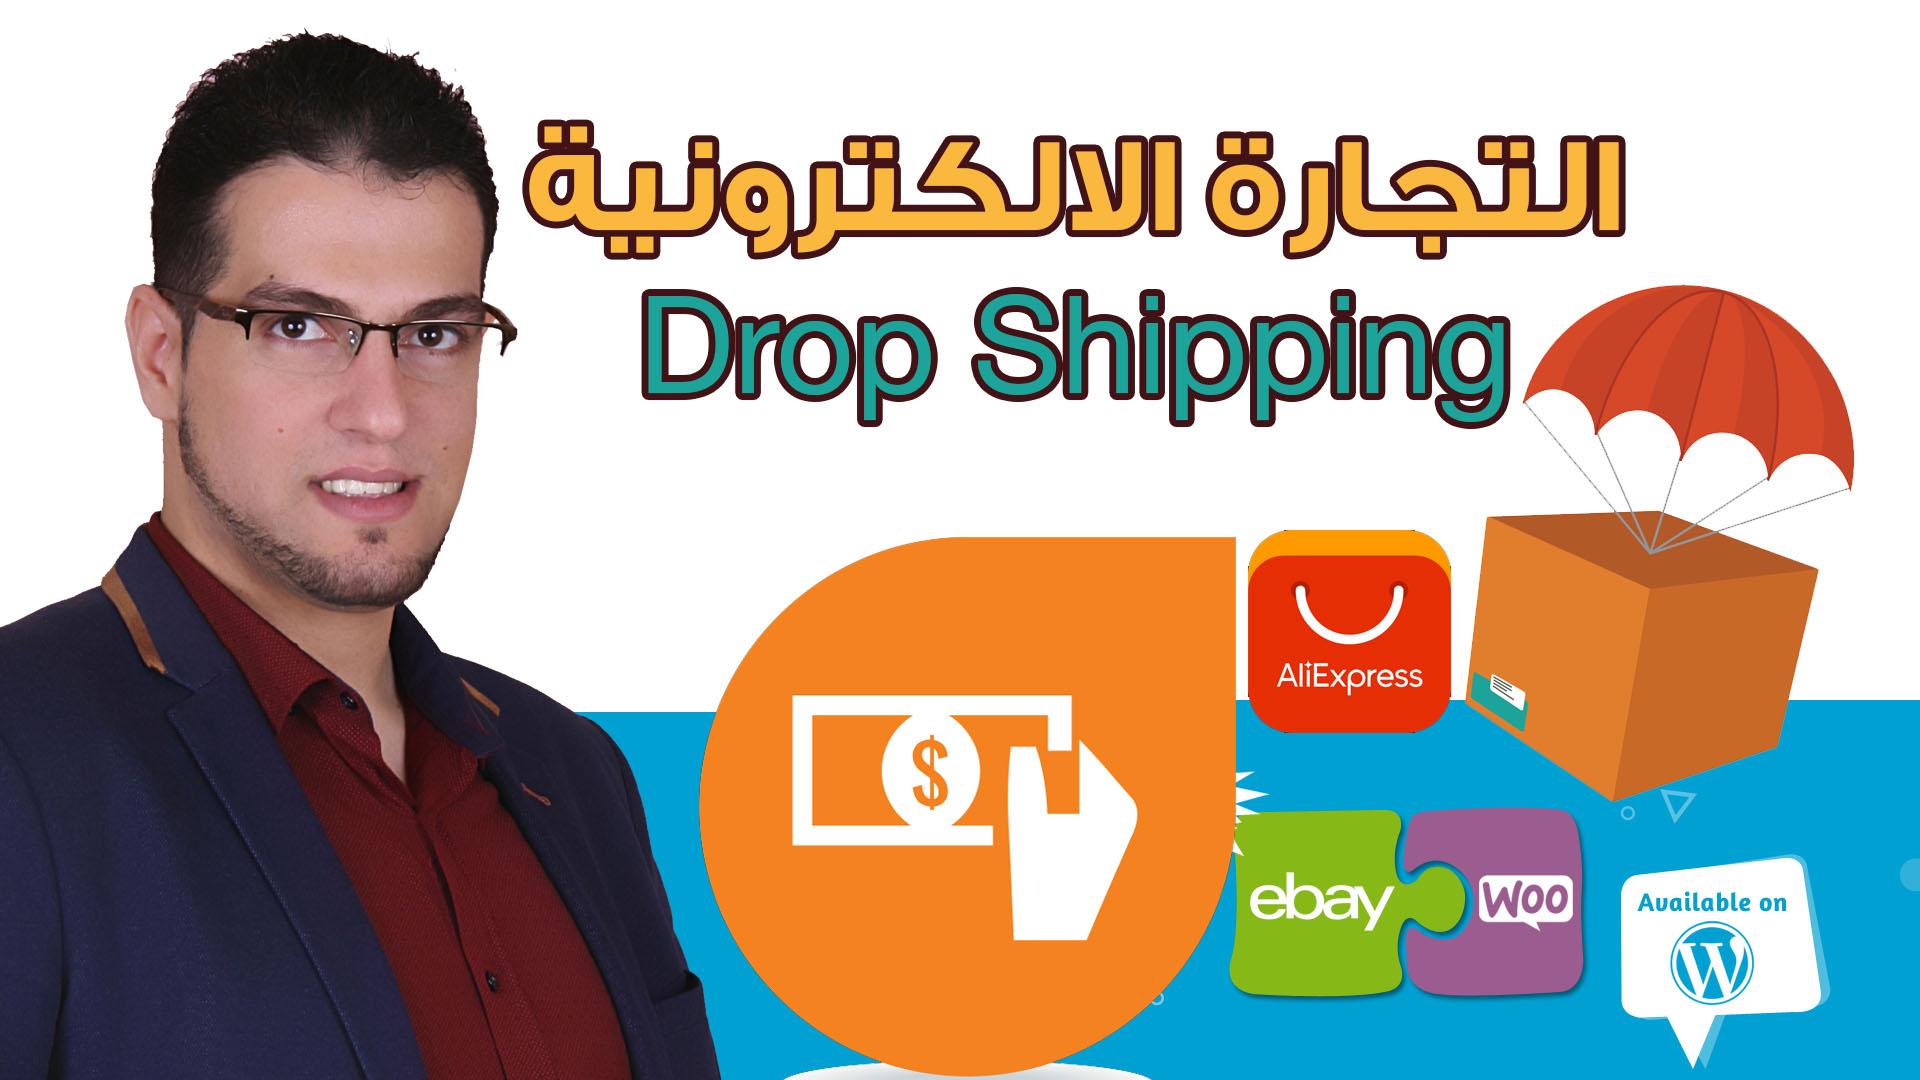 Photo of drop shipping كيفية عمل متجر ووردبريس وبيع دروب شيبنغ علي اكسبريس واي باي